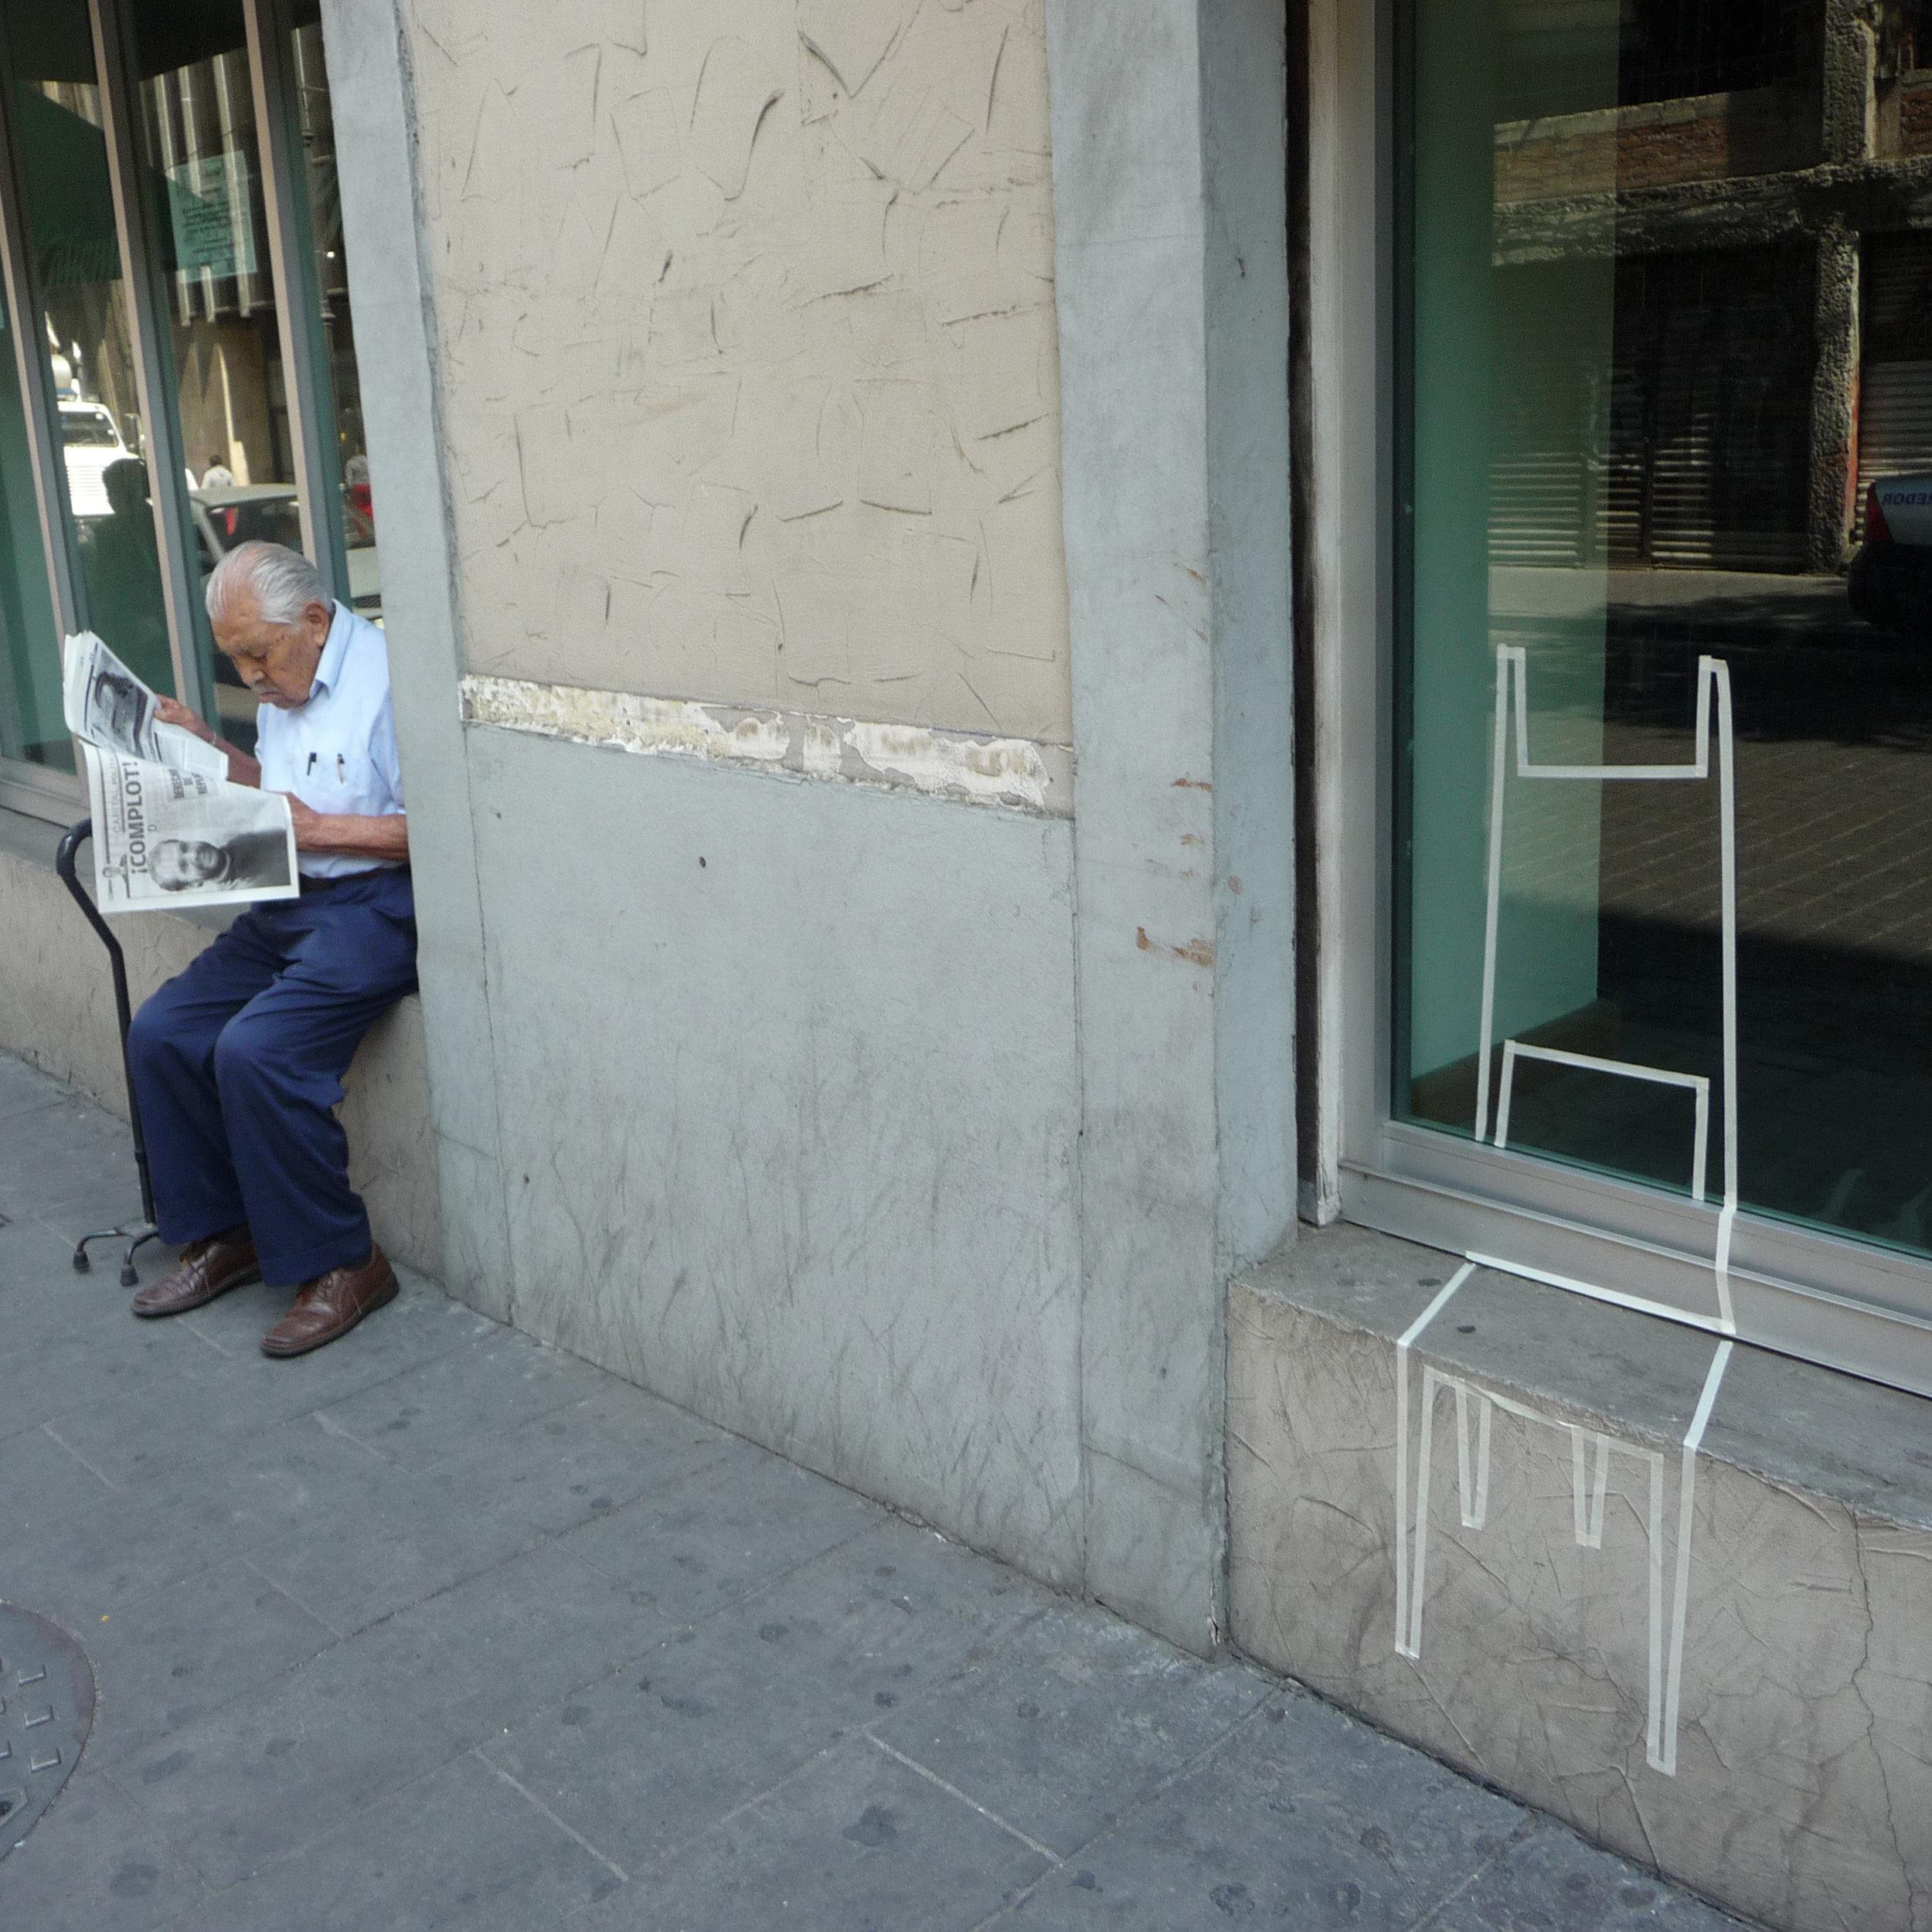 mobiliario-insinuado01.jpg